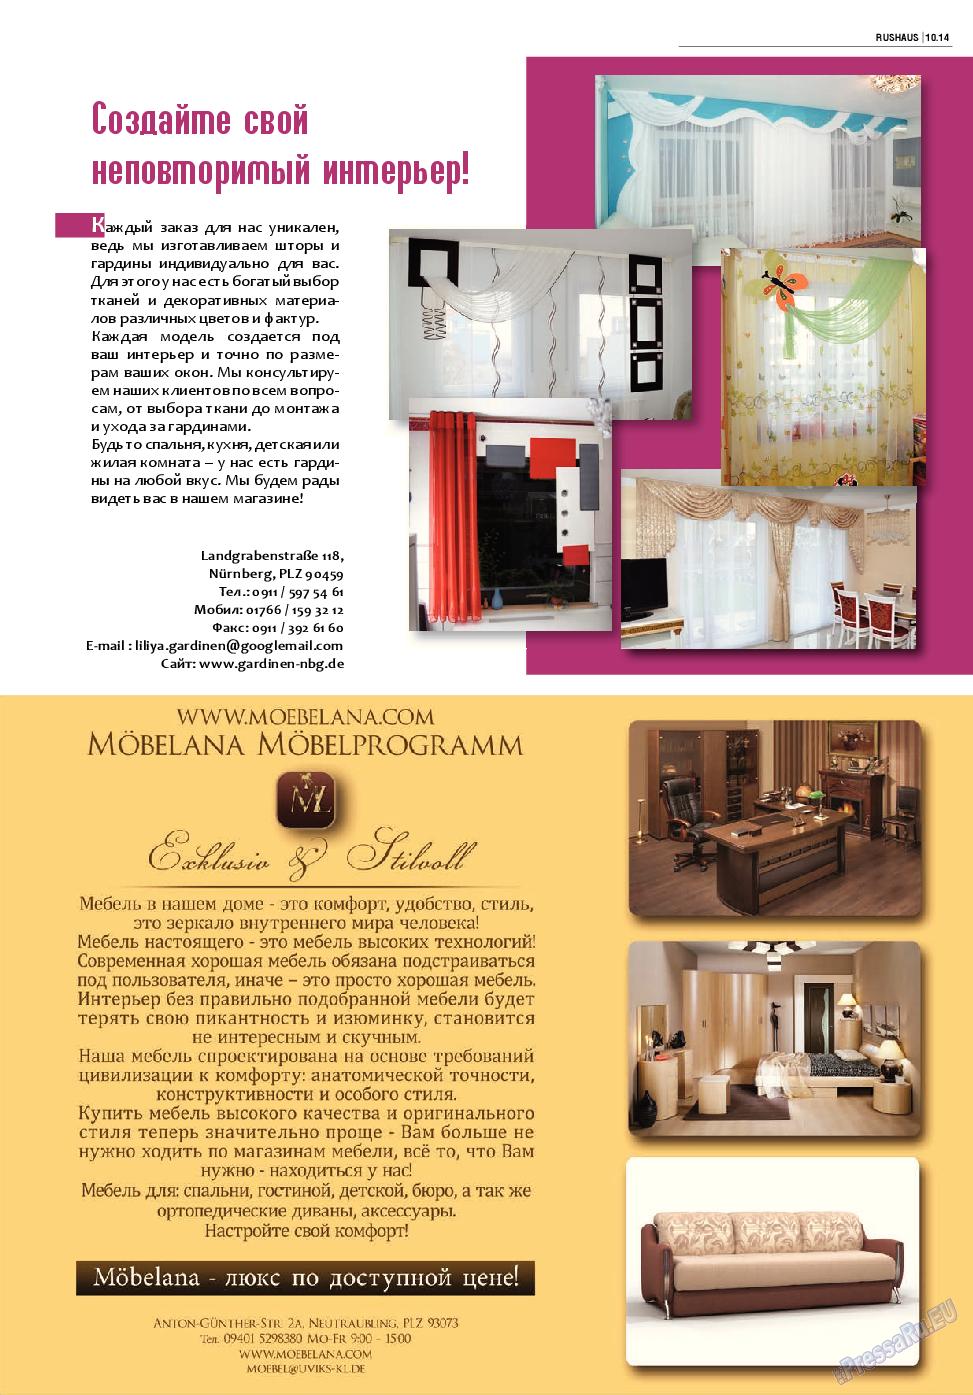 RusHaus (журнал). 2014 год, номер 2, стр. 19